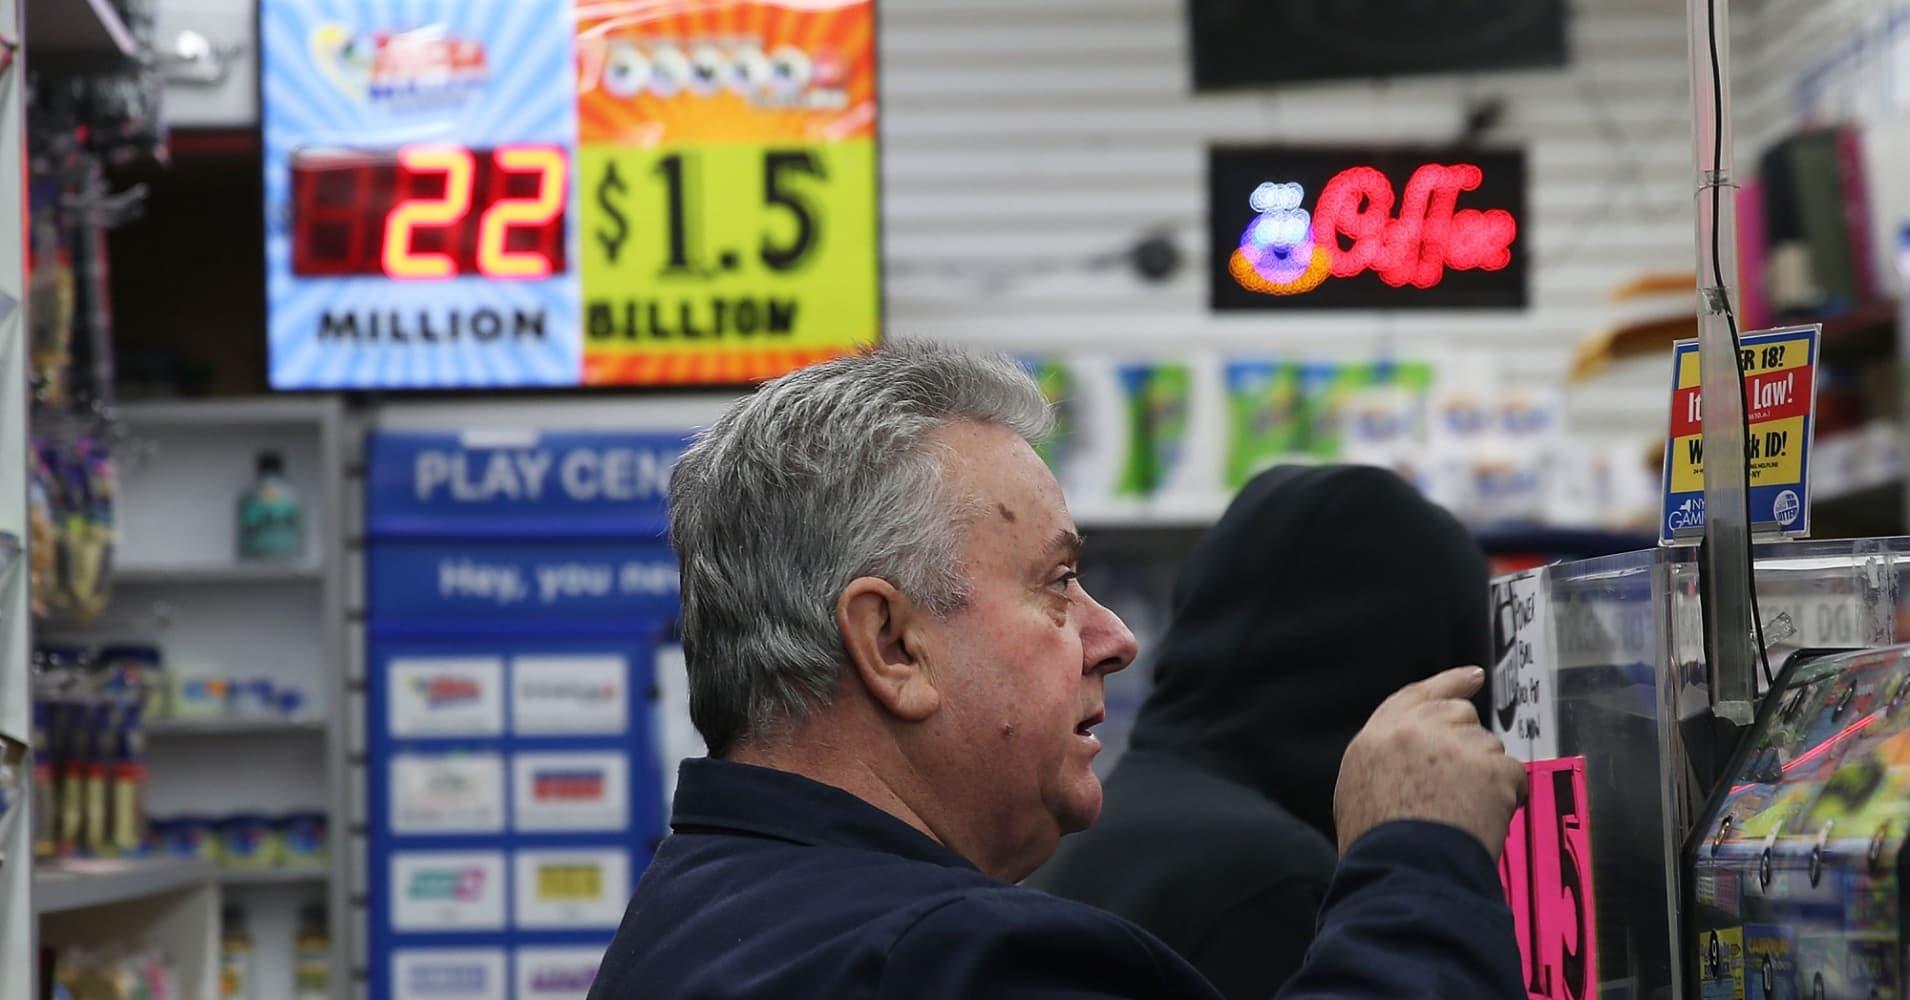 Here's why lottery winners go broke